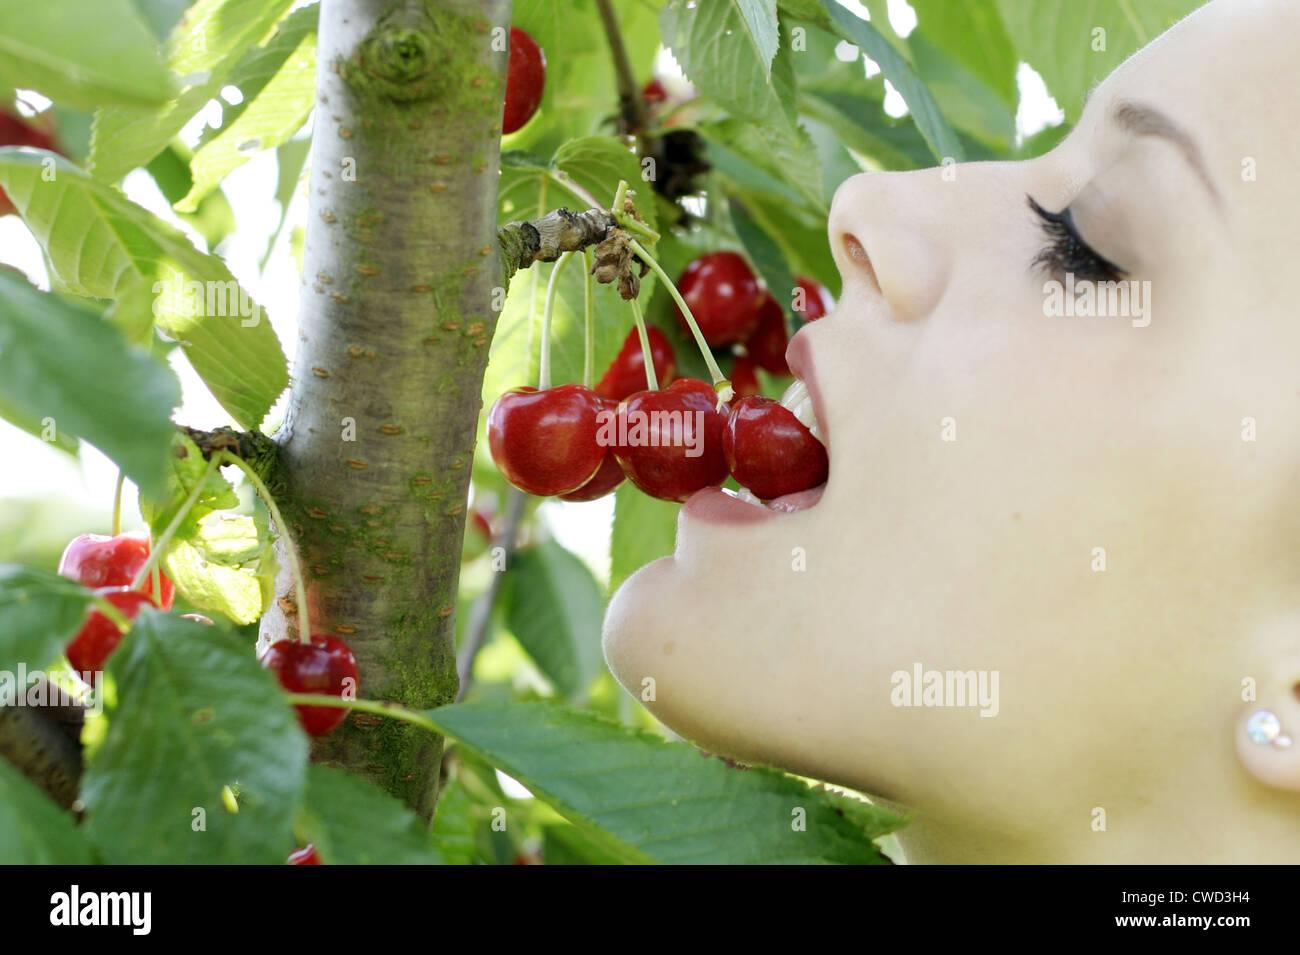 woman,indulgence,consumption,eating,cherries,harvest - Stock Image